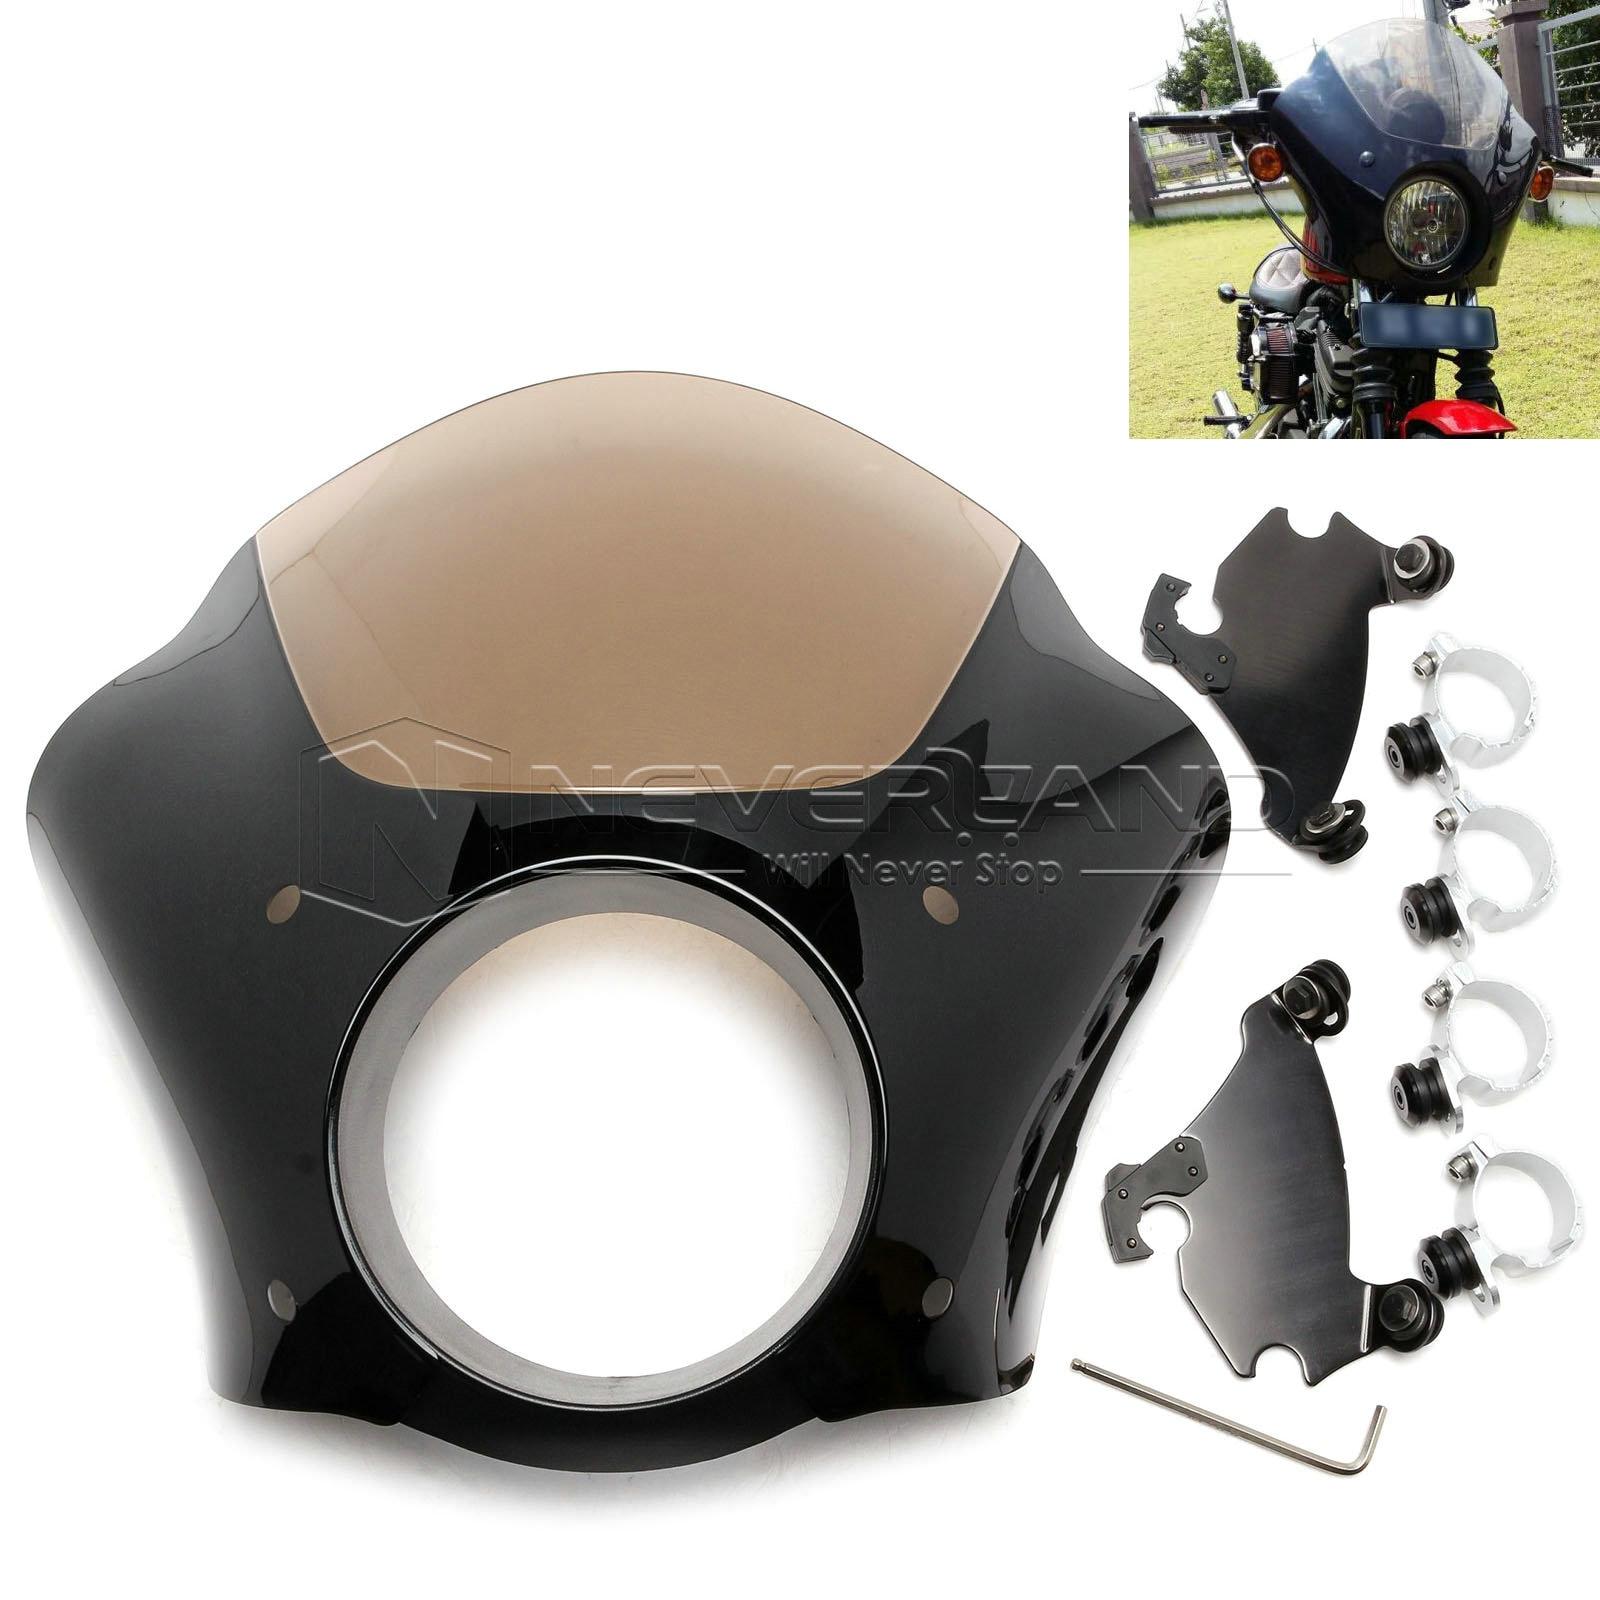 Black Gauntlet Headlight Fairing W Trigger Lock Mount Kit For Harley XL 1200 883 Freeshipping D15